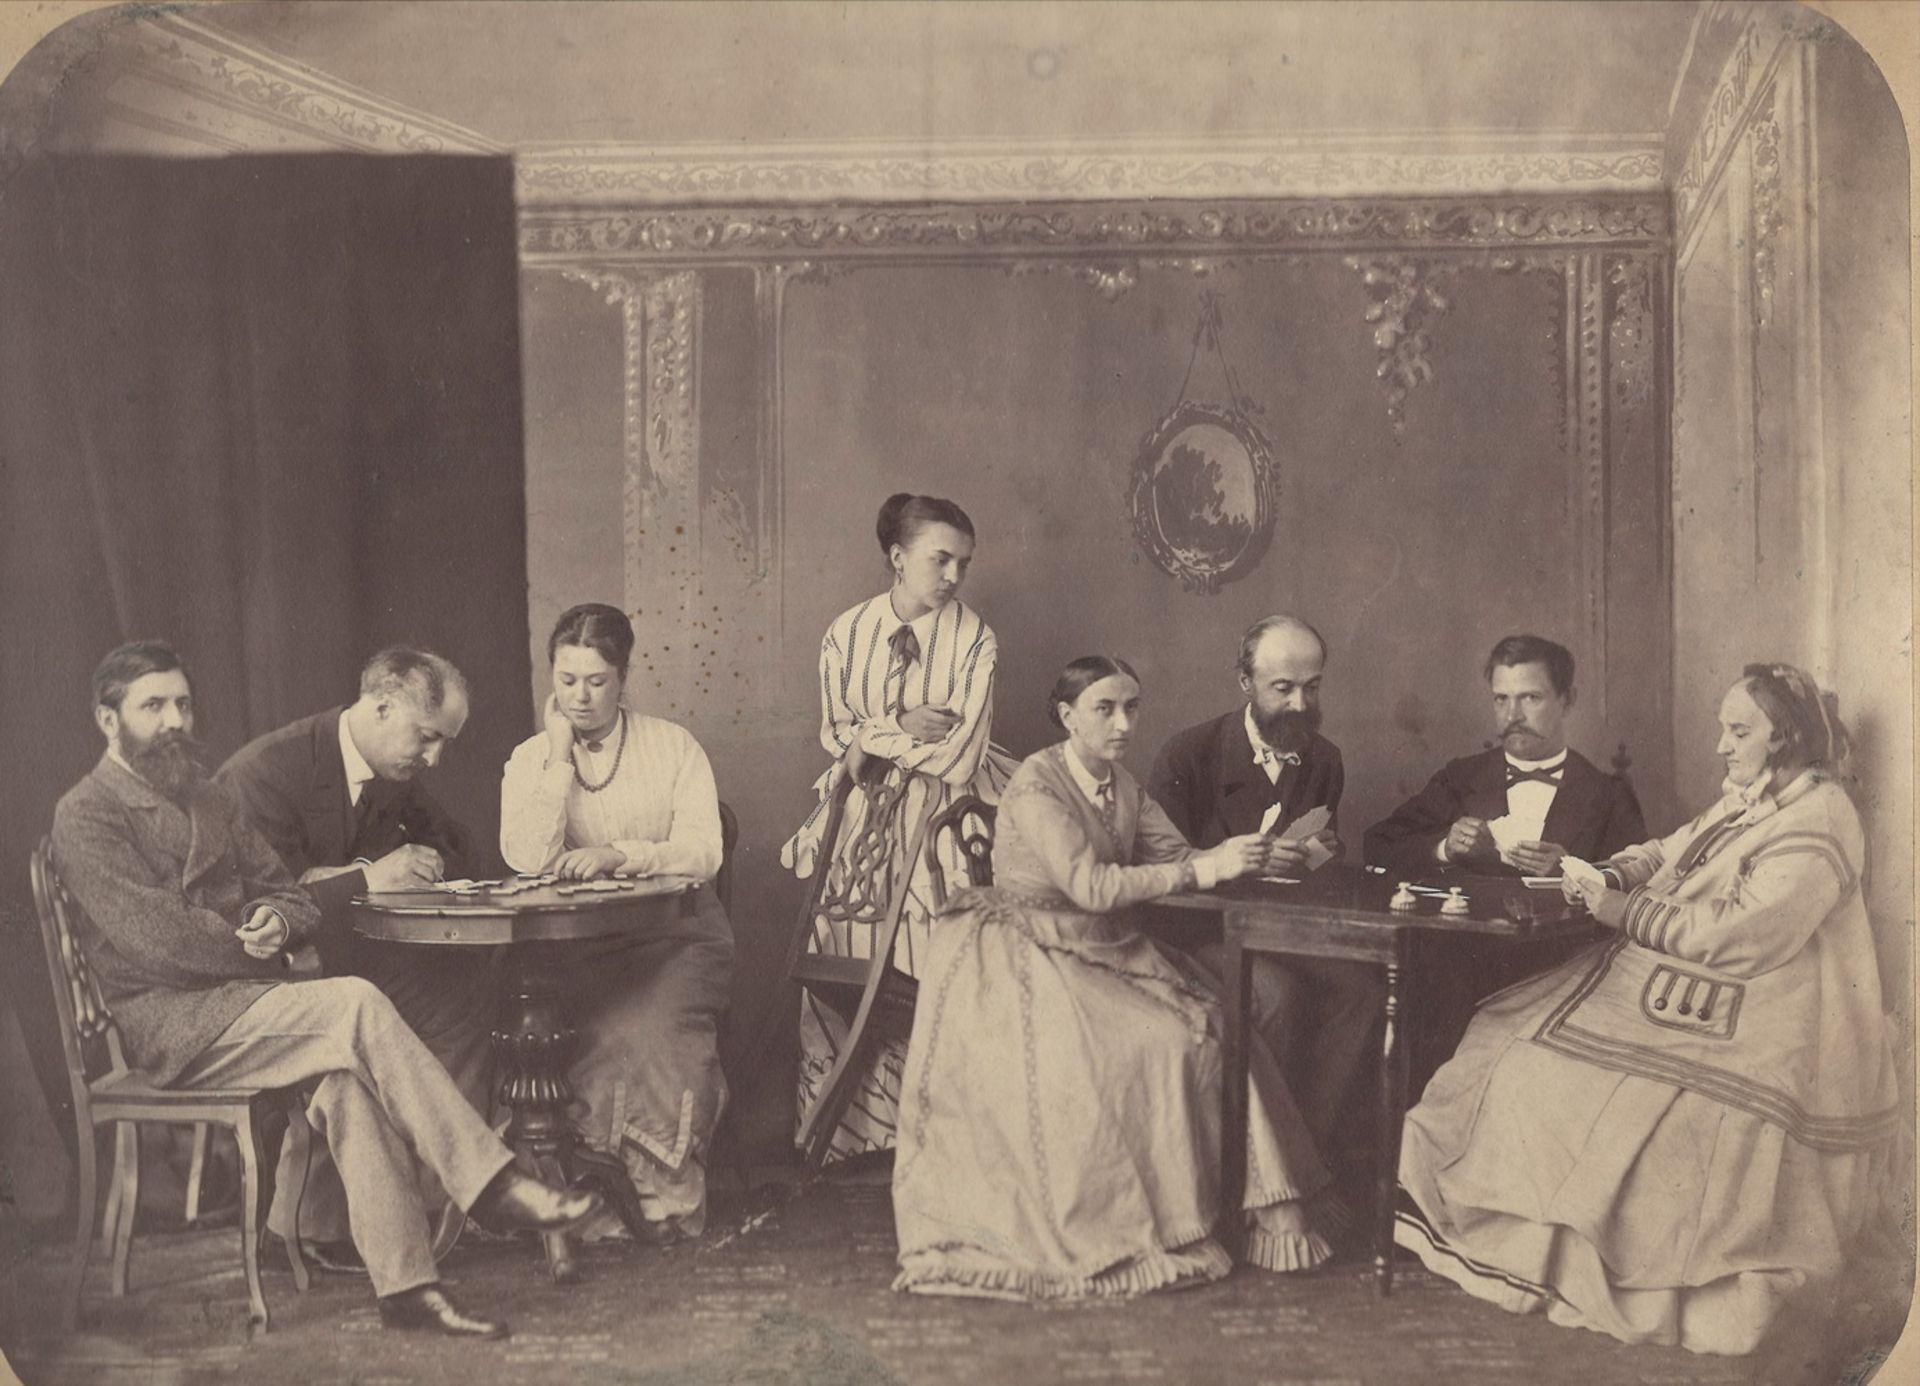 [Russian Empire]. 2 group family portraits. Photographs. Vintage prints. Late 19th century. 22x30 -  - Bild 3 aus 4